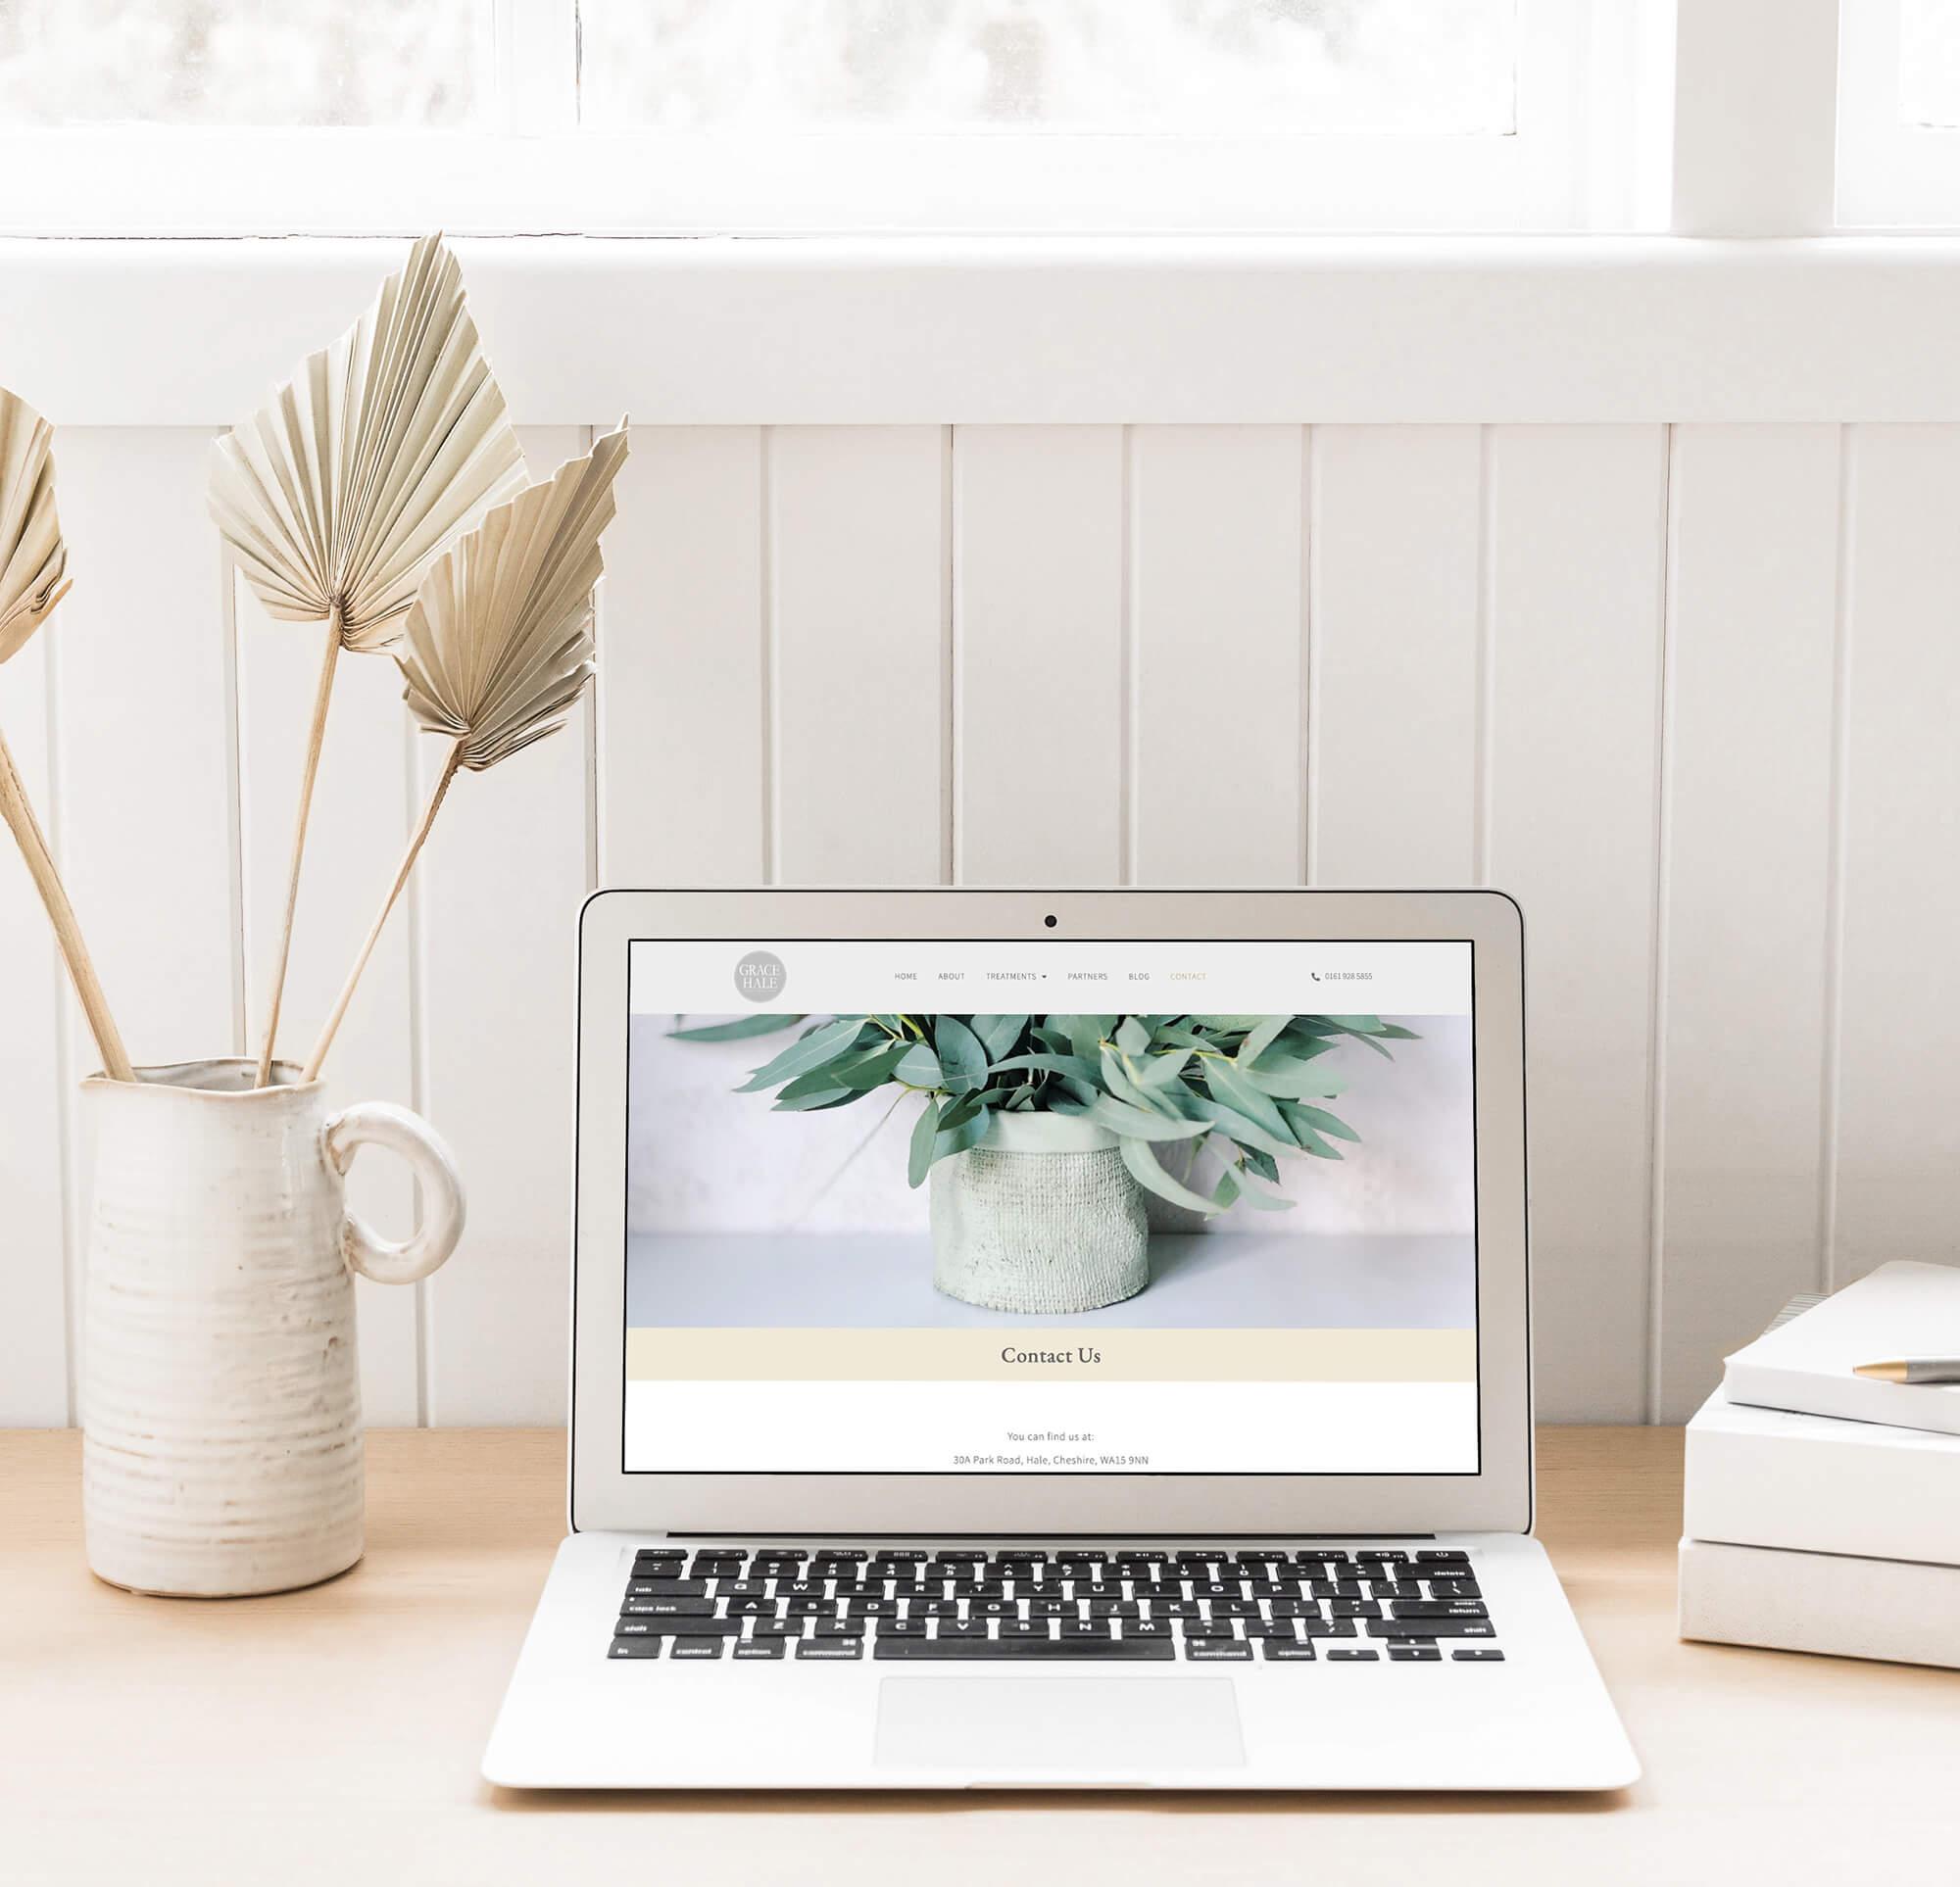 Grace Hale beauty salon website design on laptop